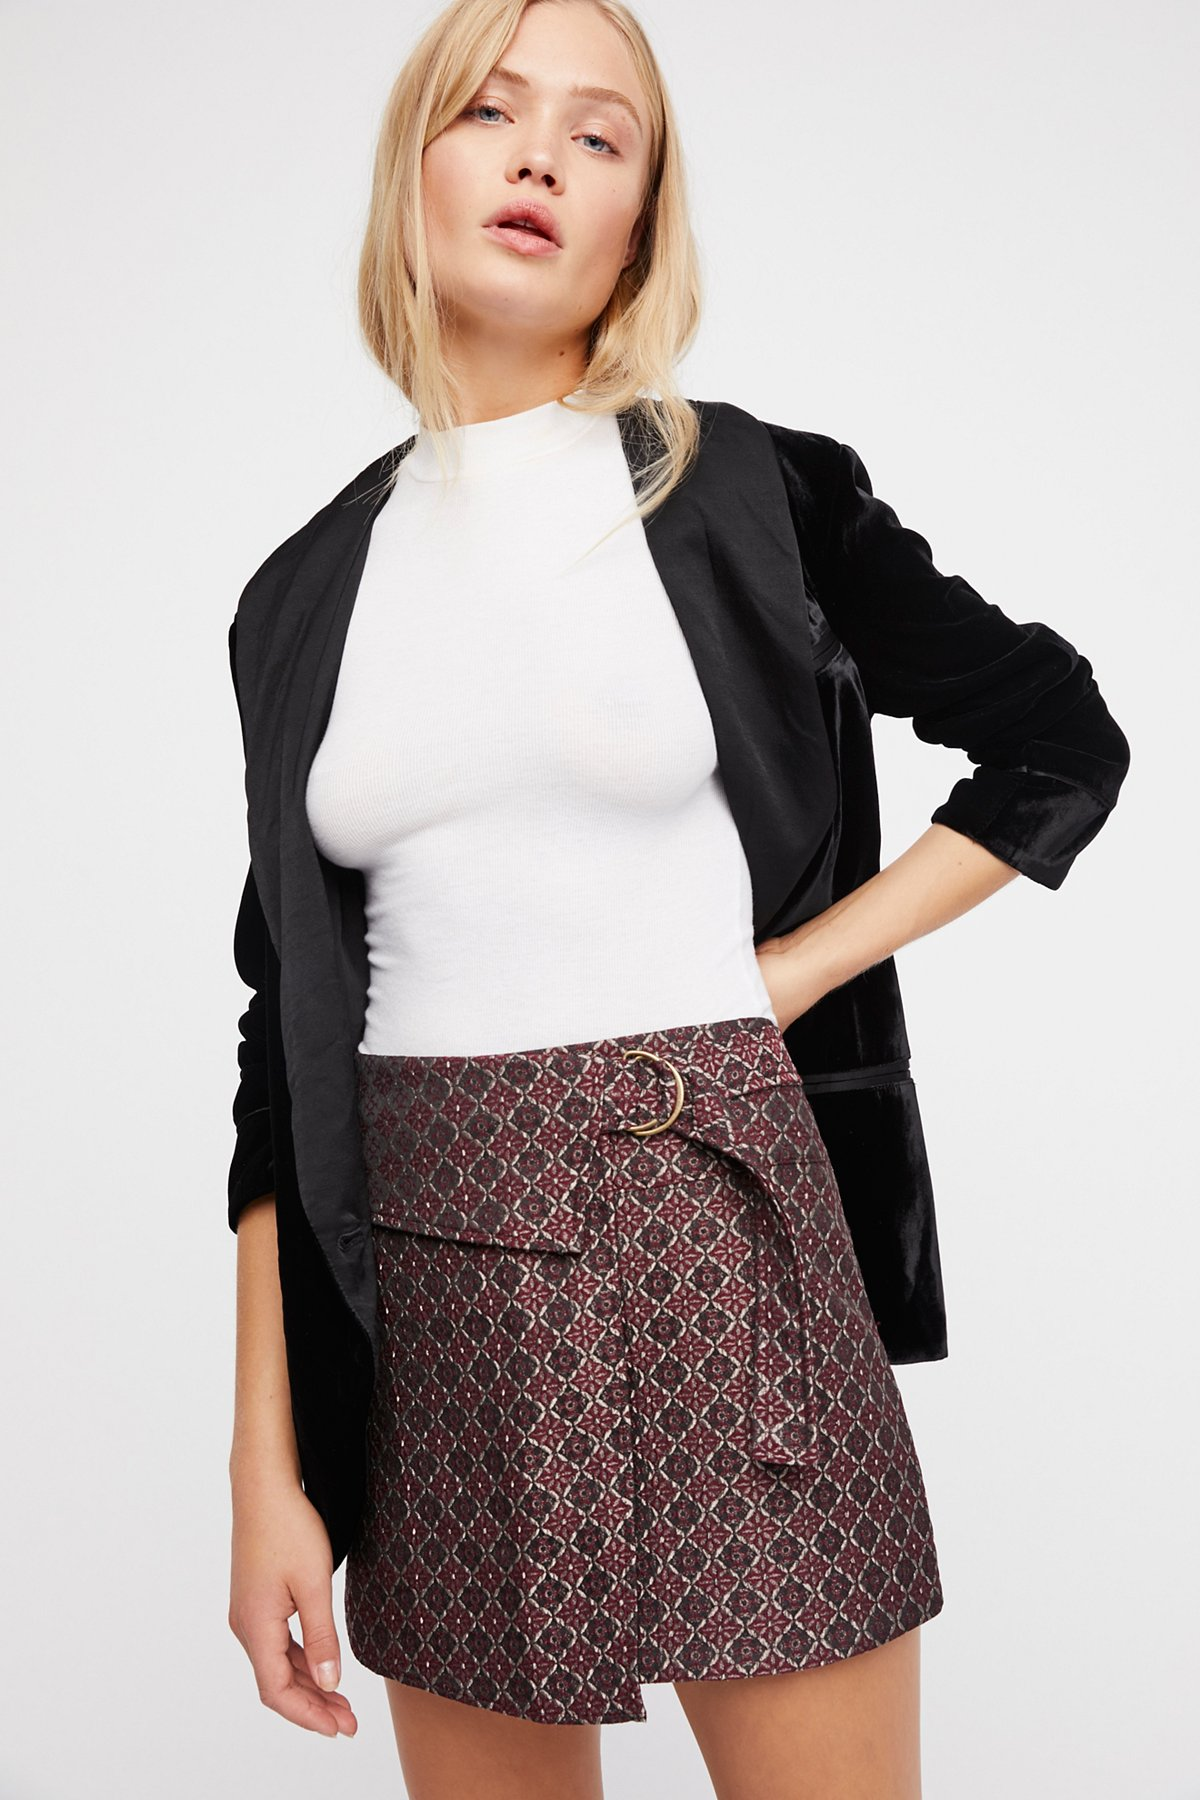 All The Shine Mini Skirt